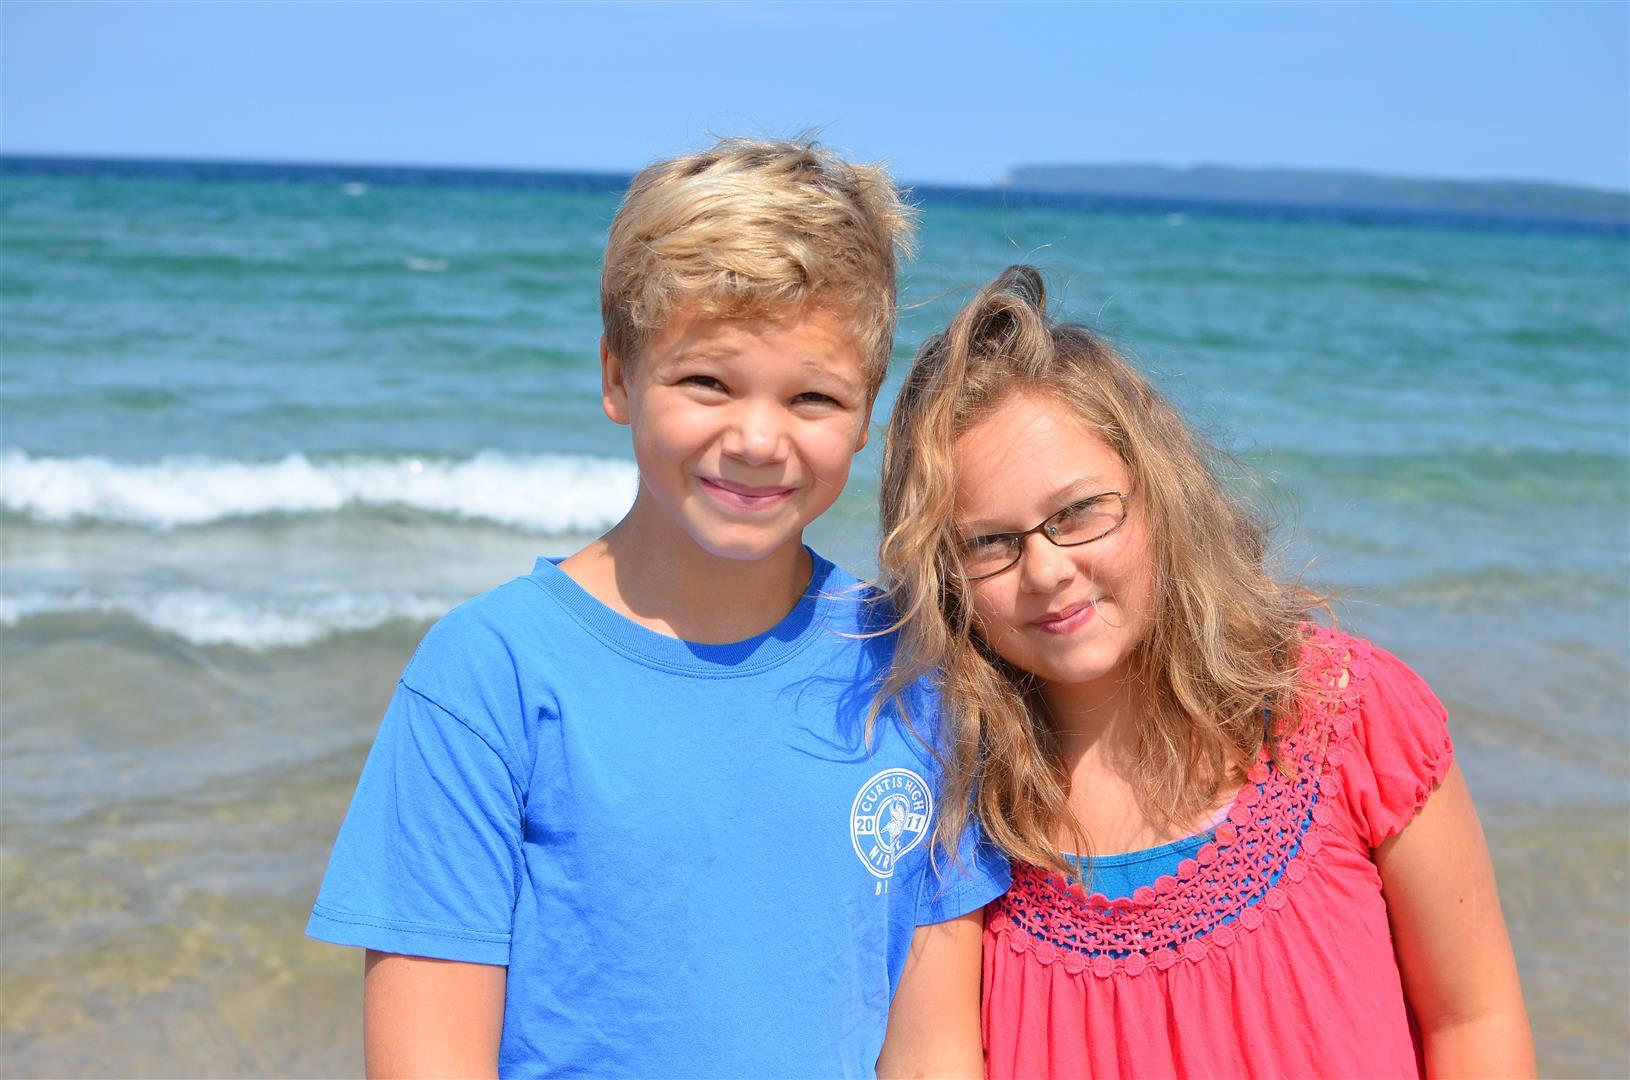 David and Sarah - the last of my homeschooling kiddos!